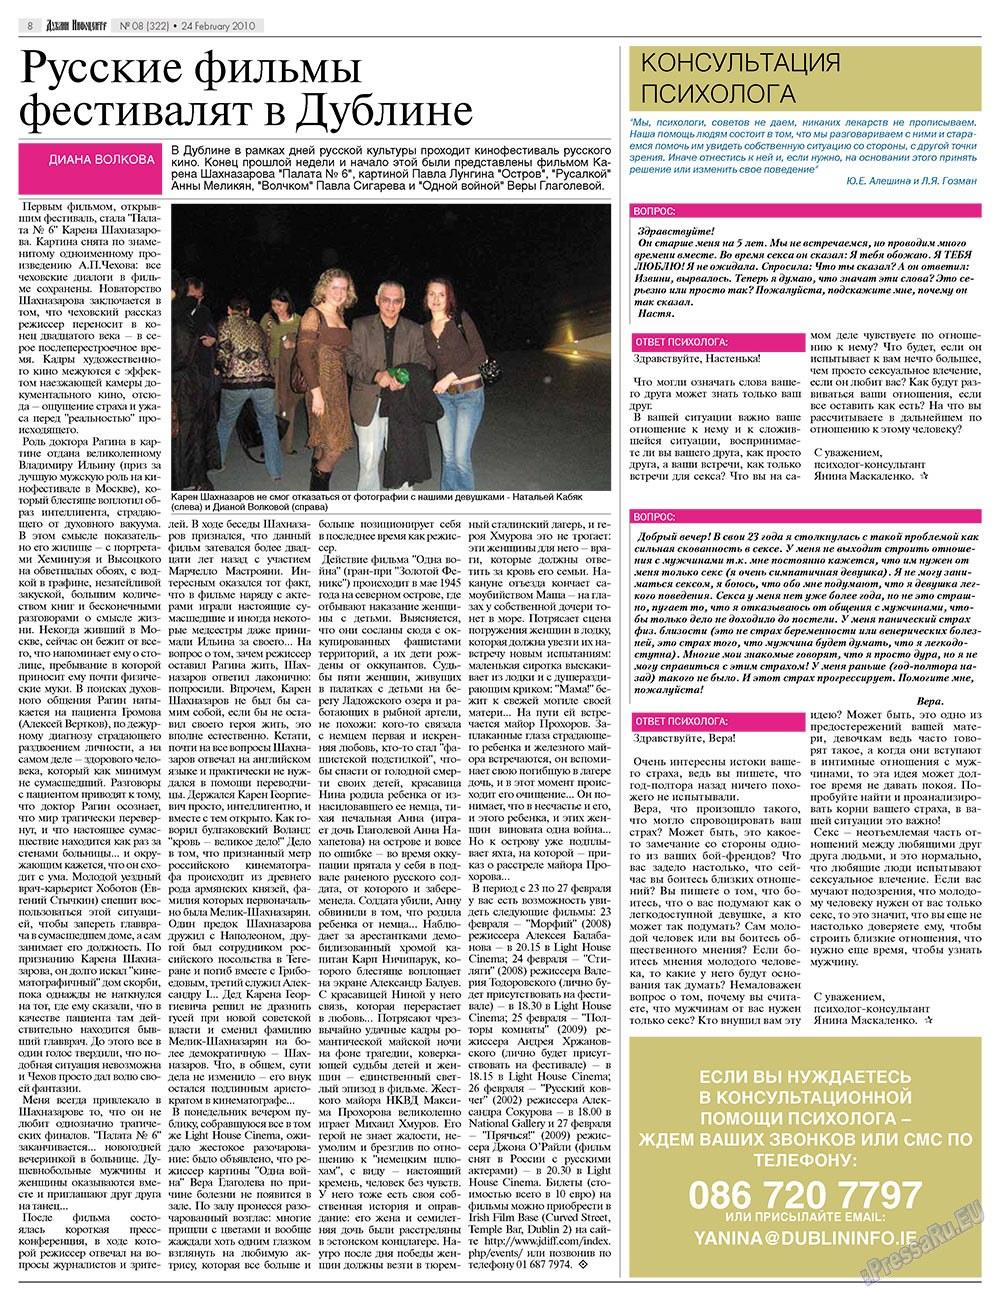 Дублин инфоцентр (газета). 2010 год, номер 8, стр. 8